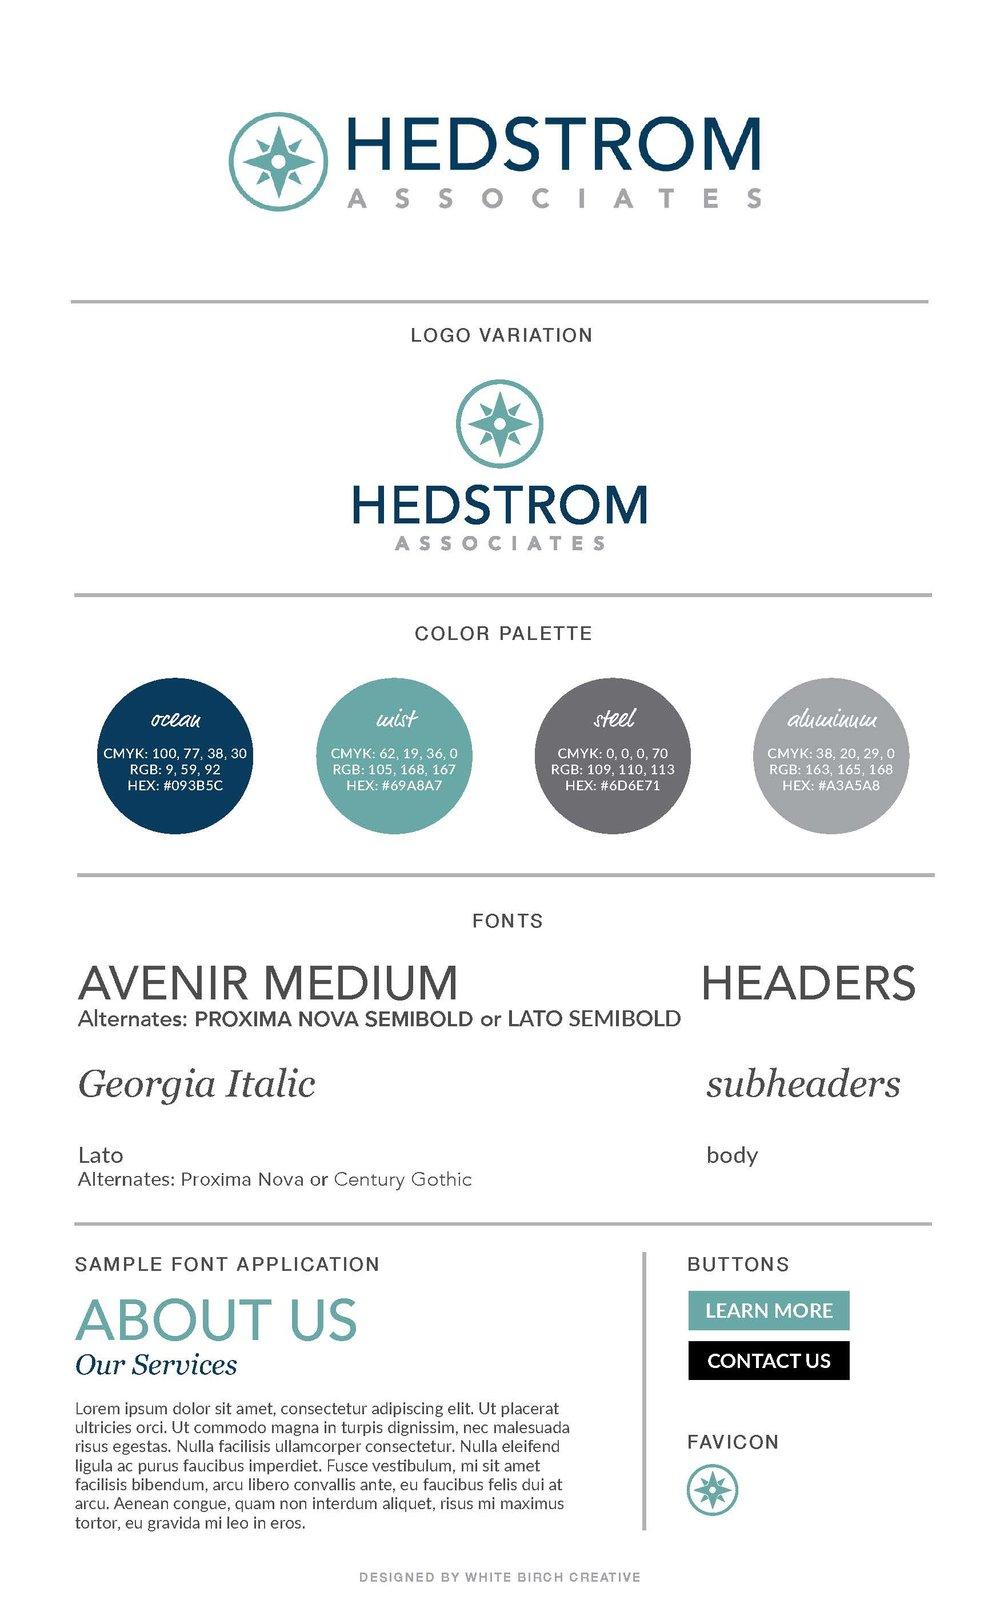 HA Style Guide.jpg